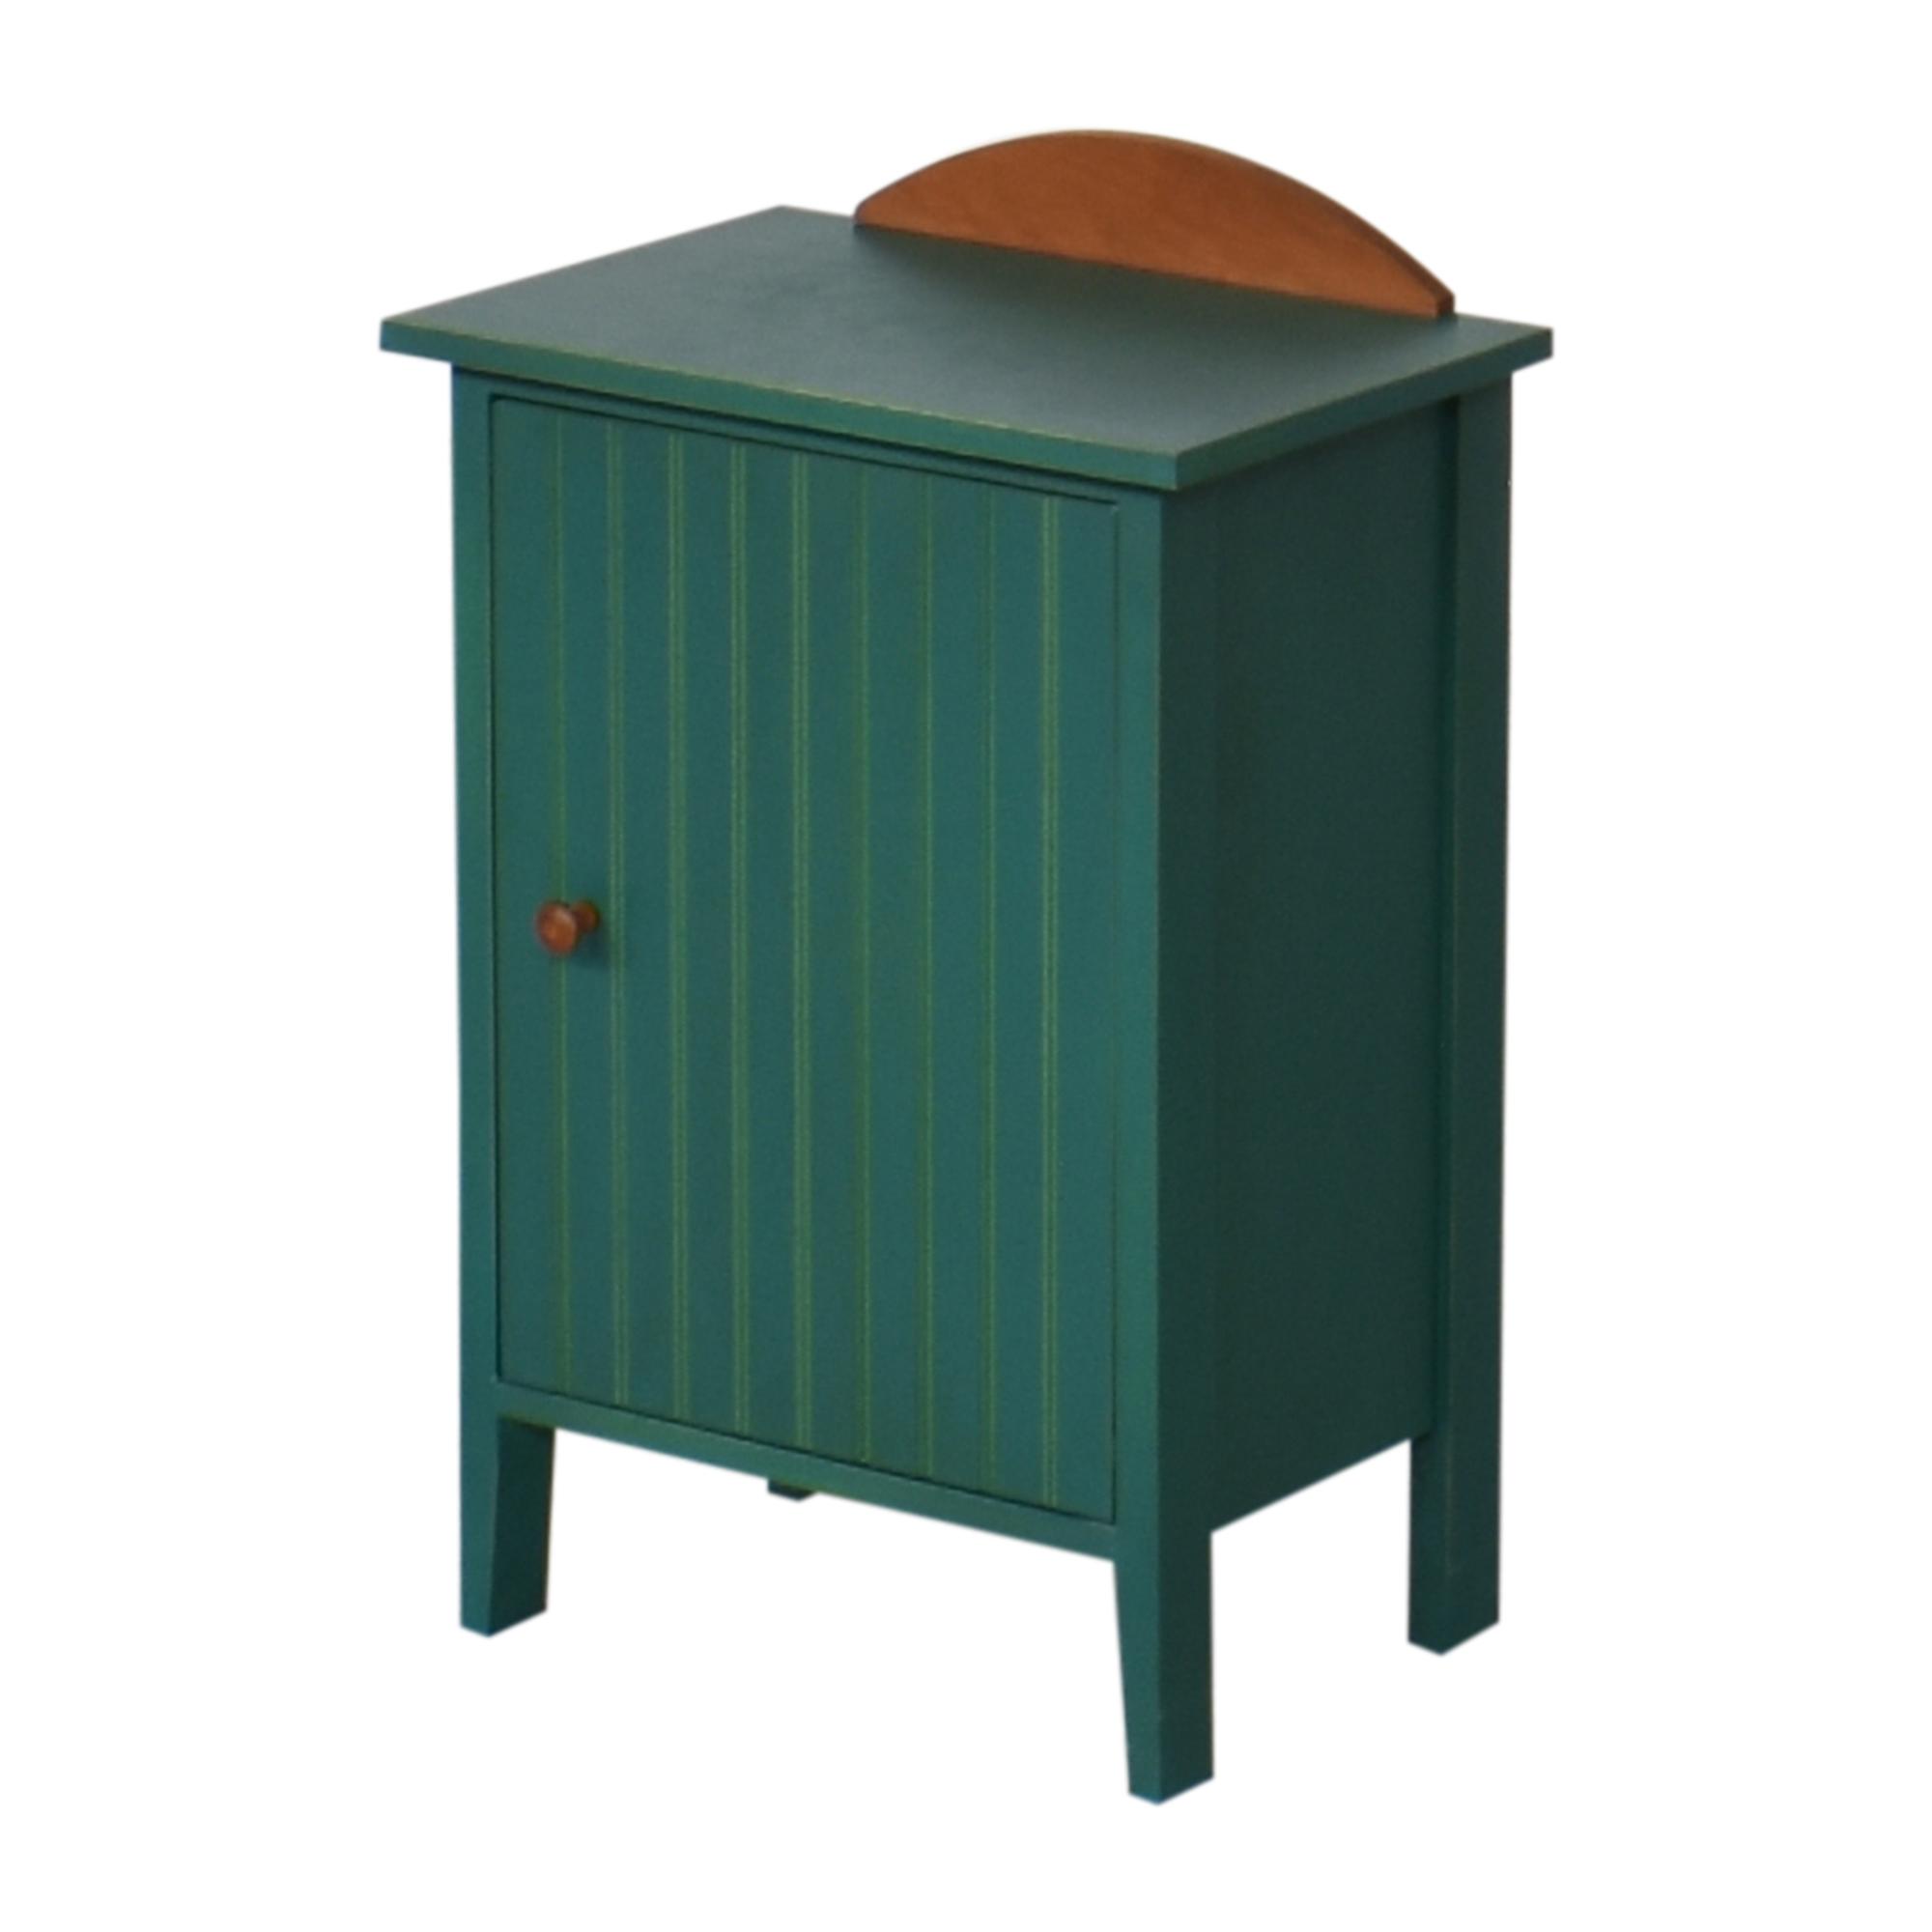 Maine Cottage Maine Cottage Island Bedside Cabinet on sale